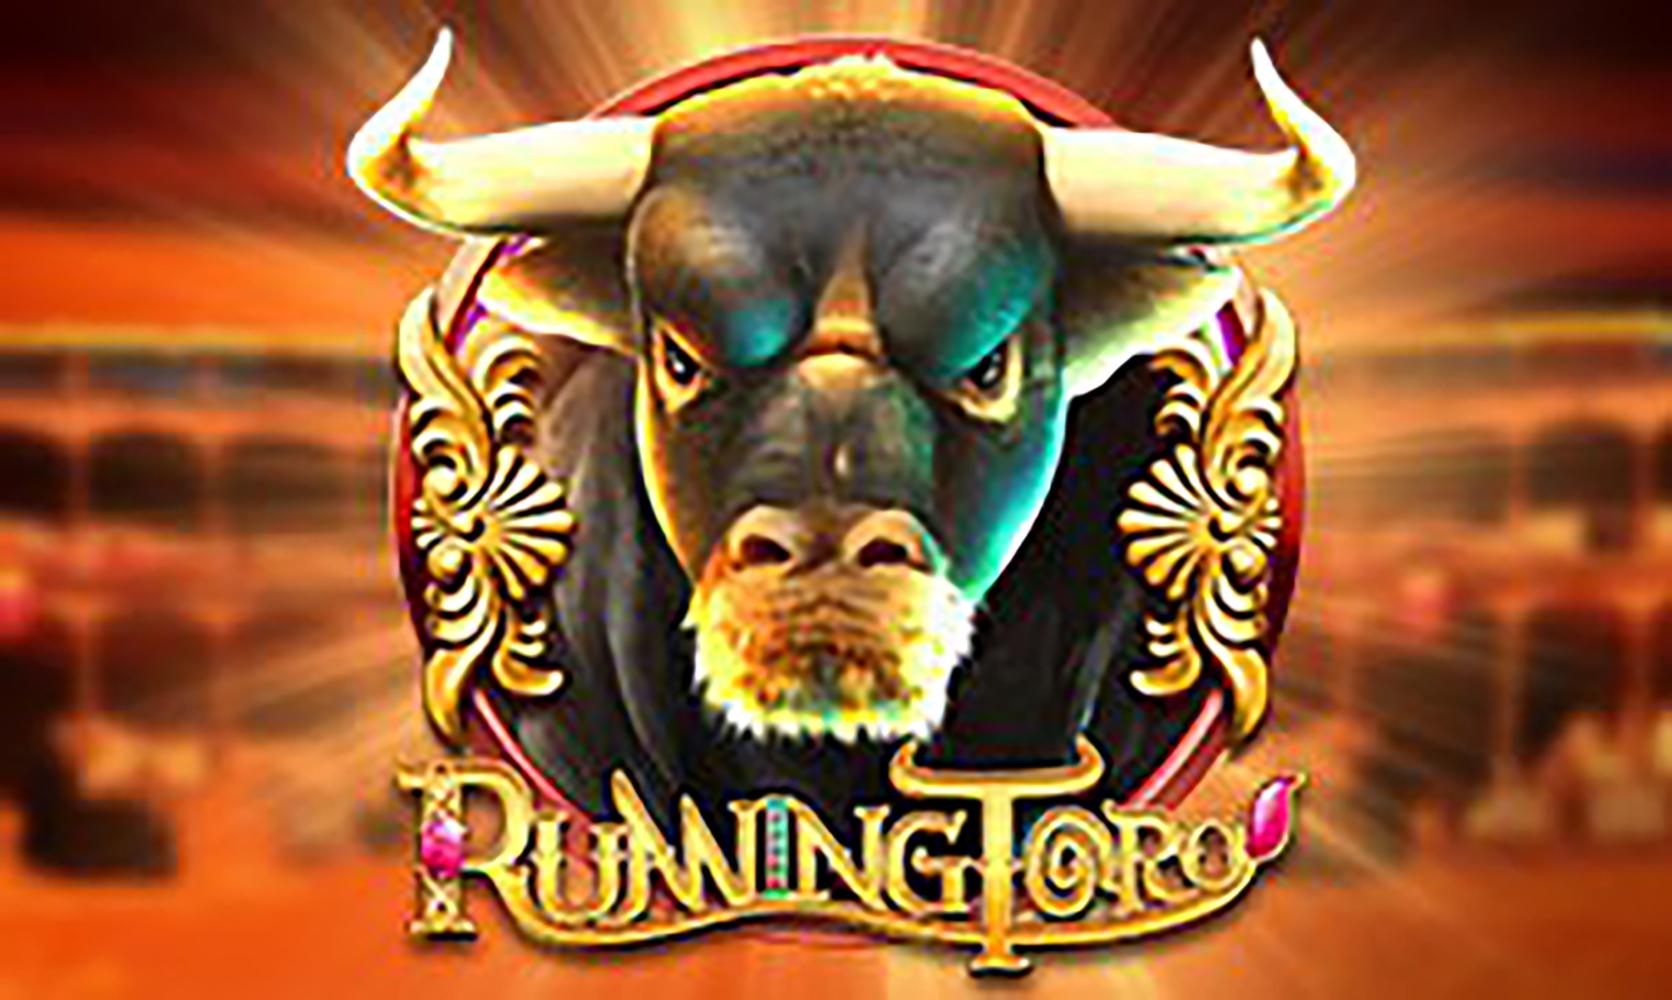 cq9-RunningToro